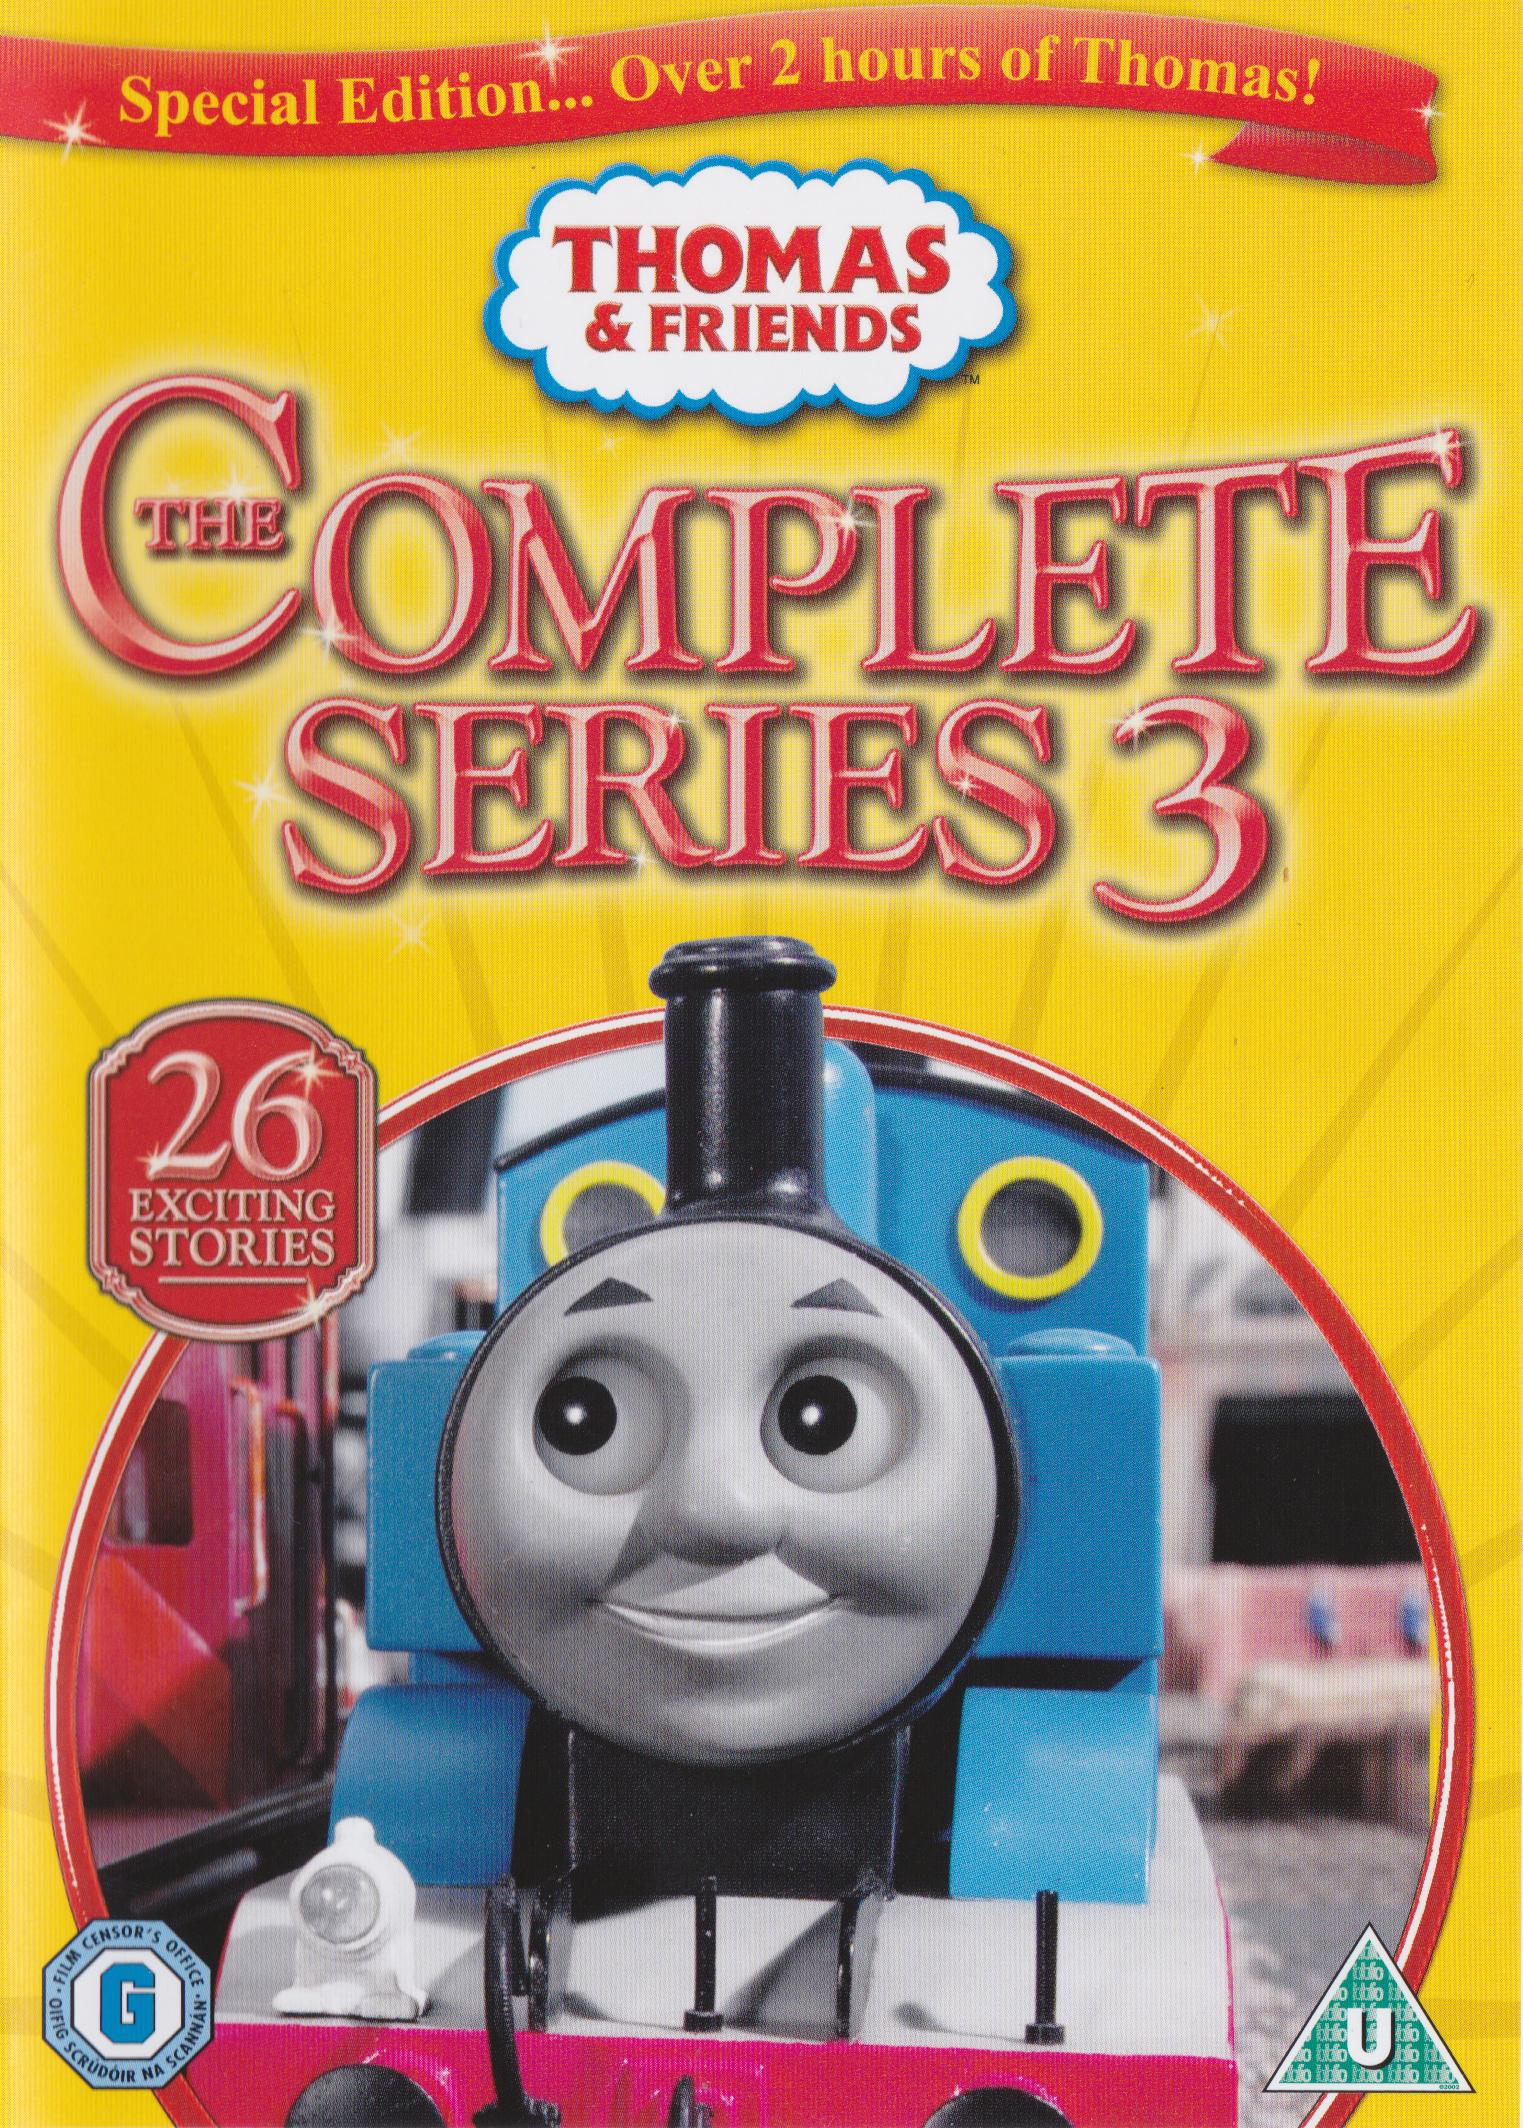 The Complete Series 3 Thomas The Tank Engine Wikia